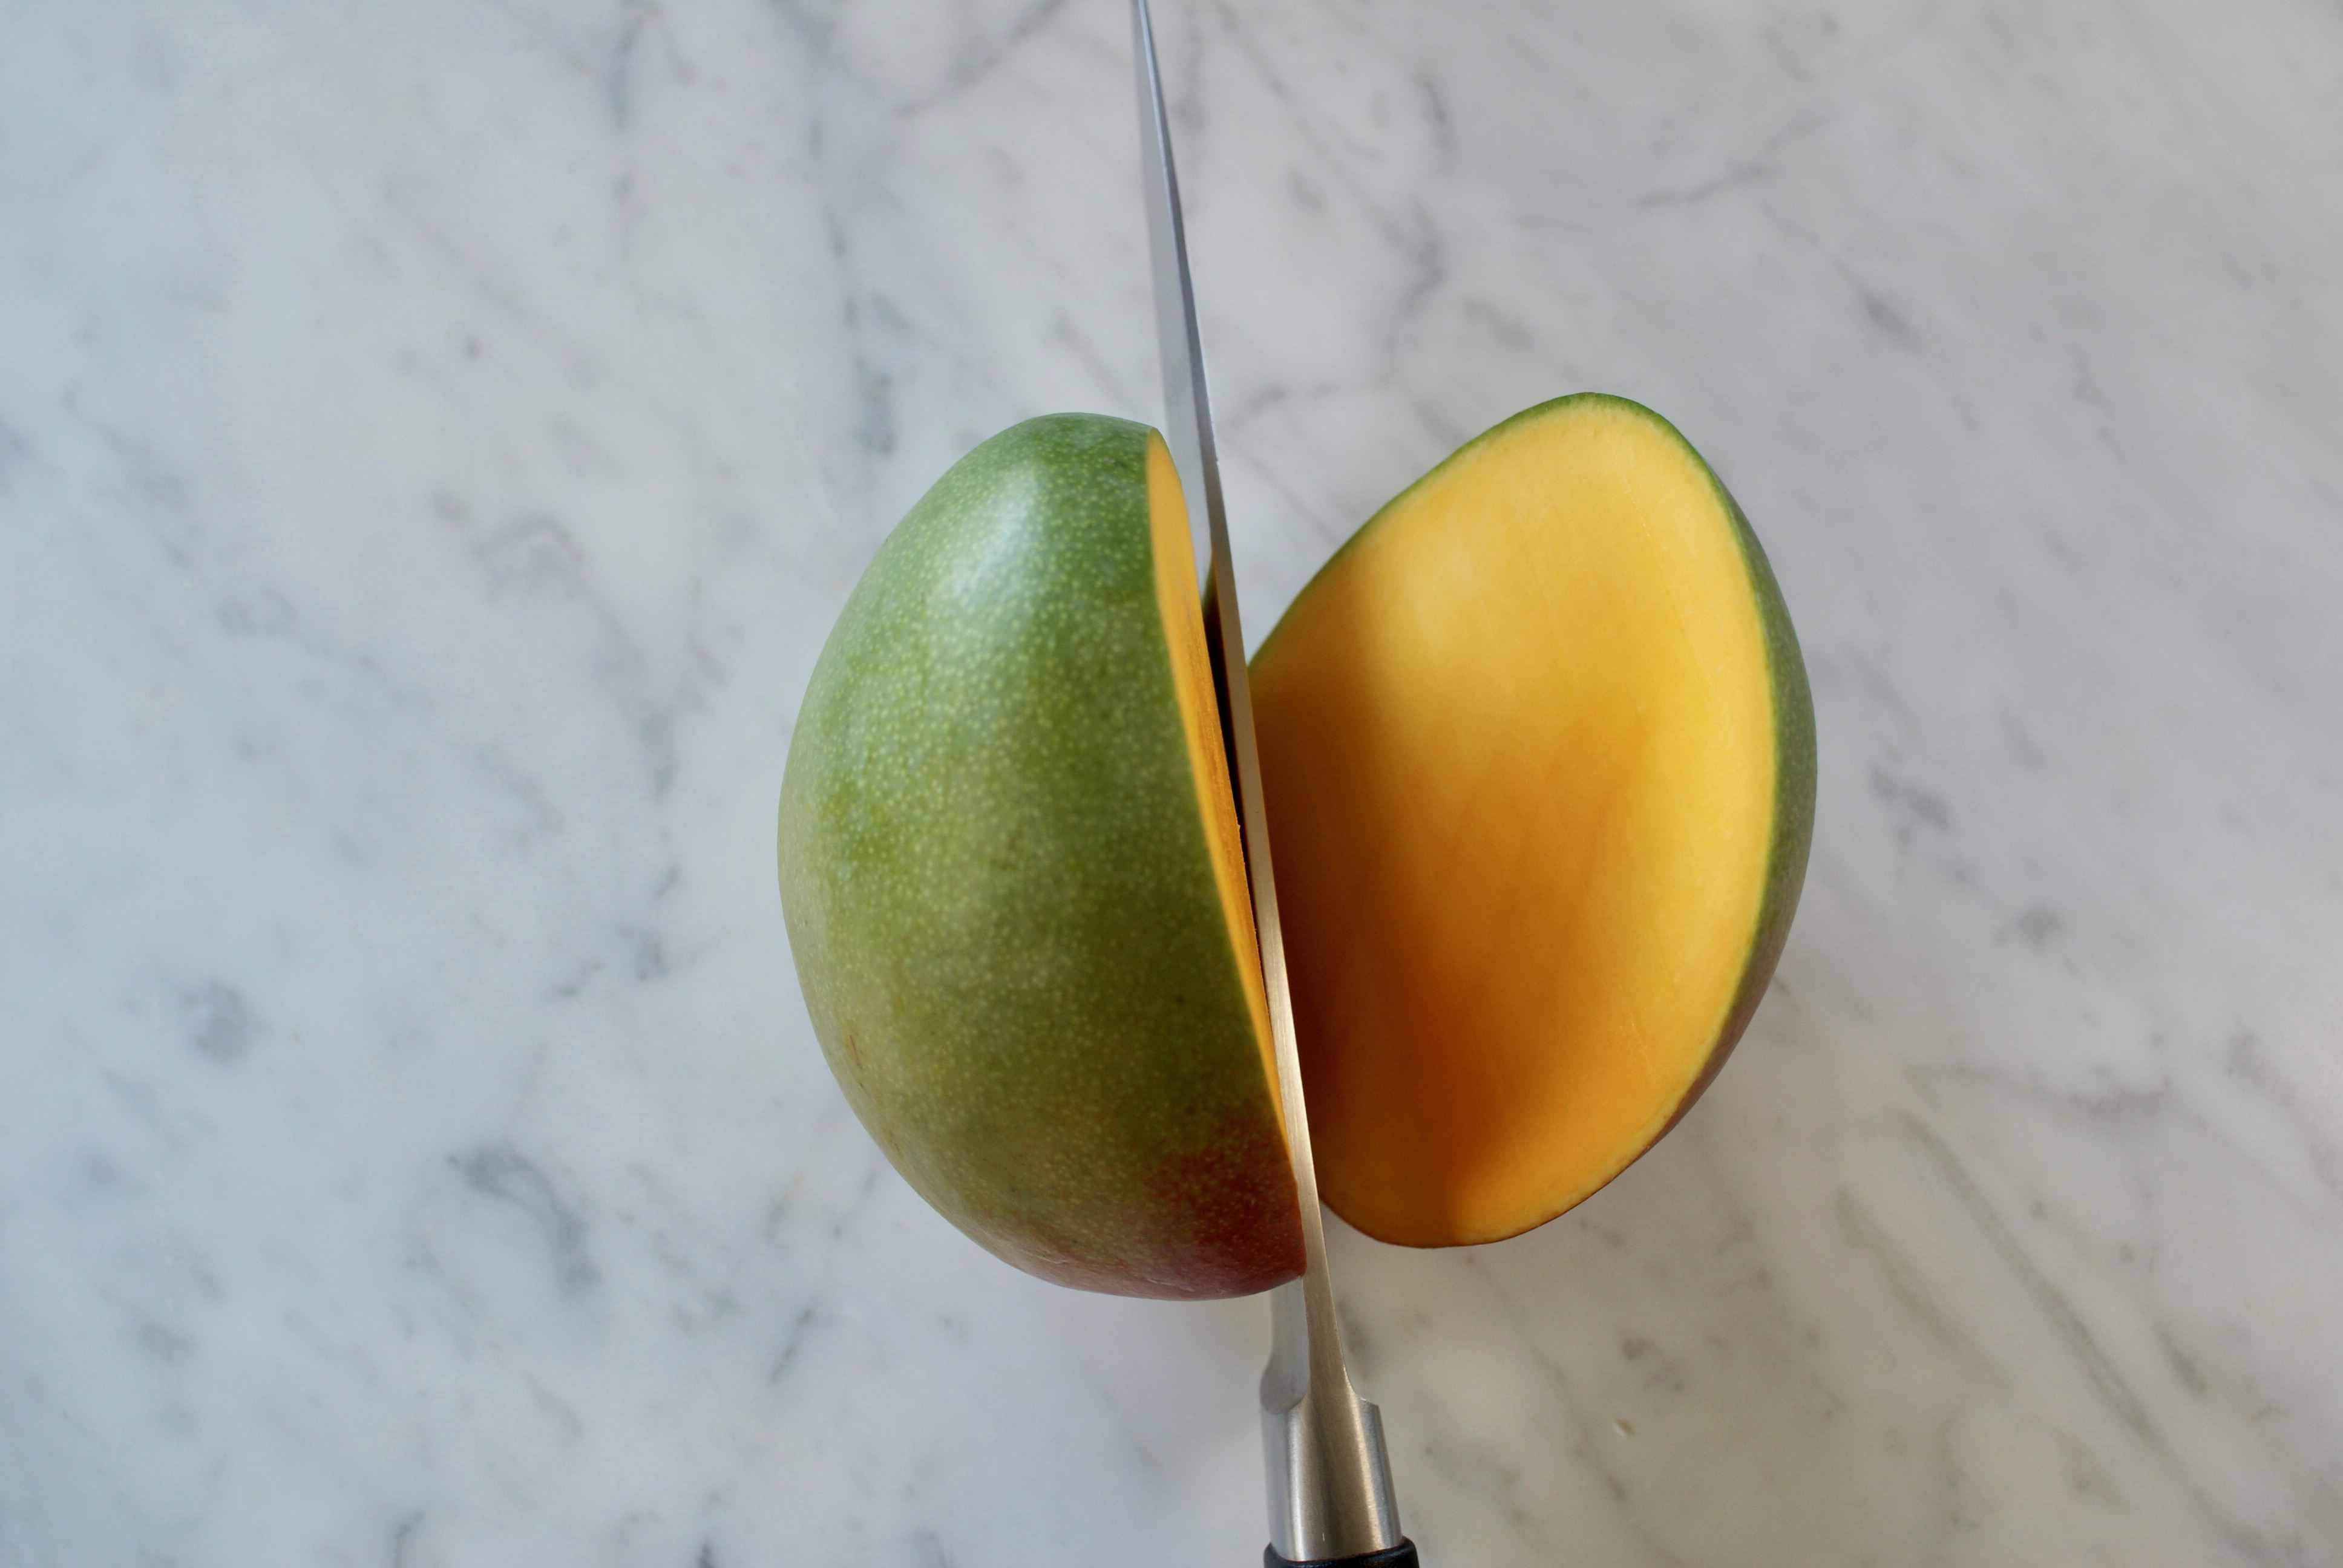 Chopping Mango